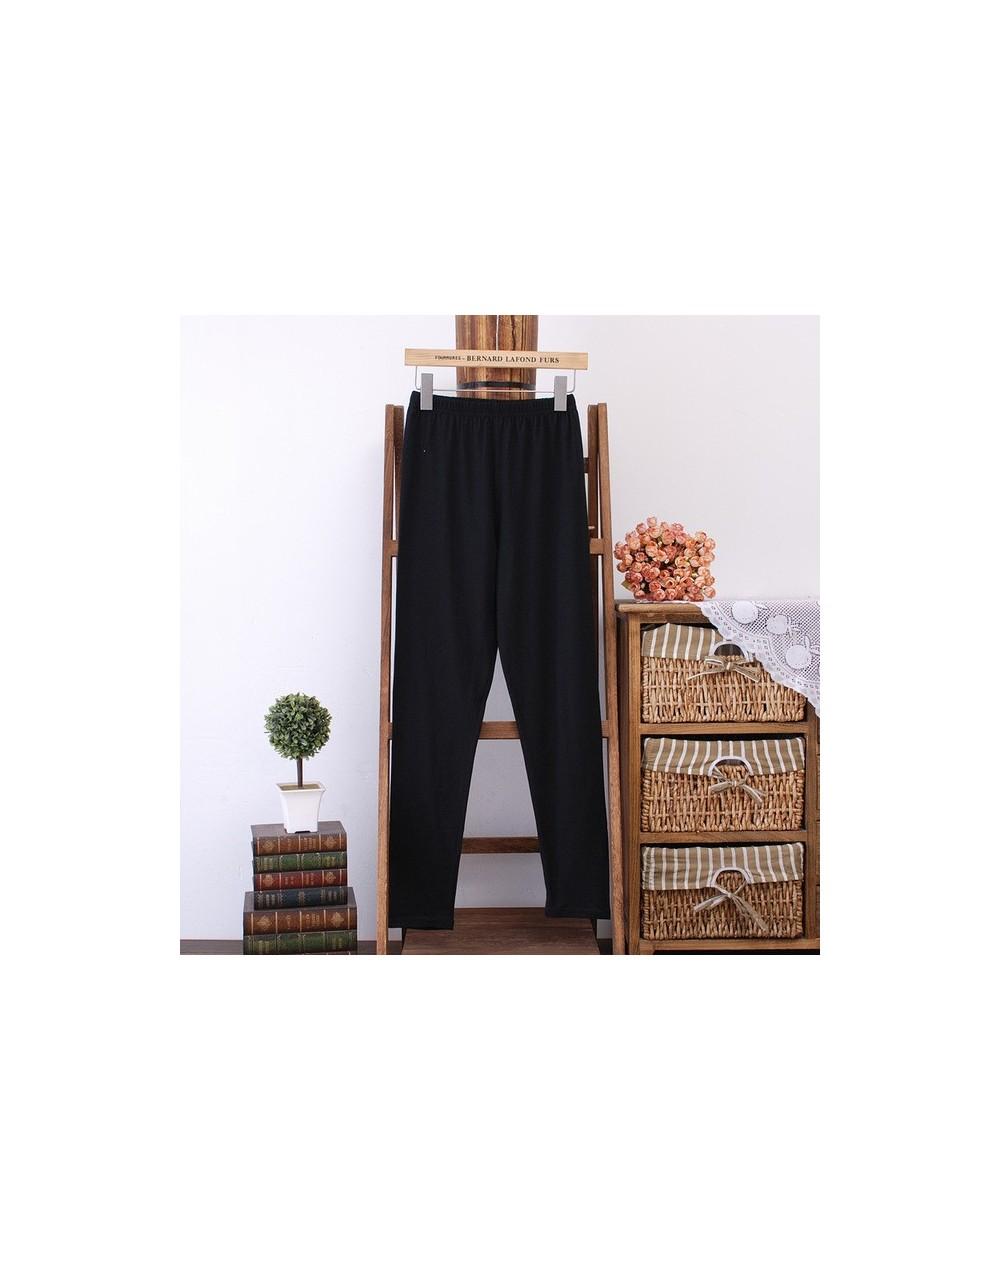 Women Leggings Plus Size 3 4 XL Thin Slim Elastic Skinny Bodycon Leggings Black Pink White Blue Green QYL04 - Black - 4X3935...